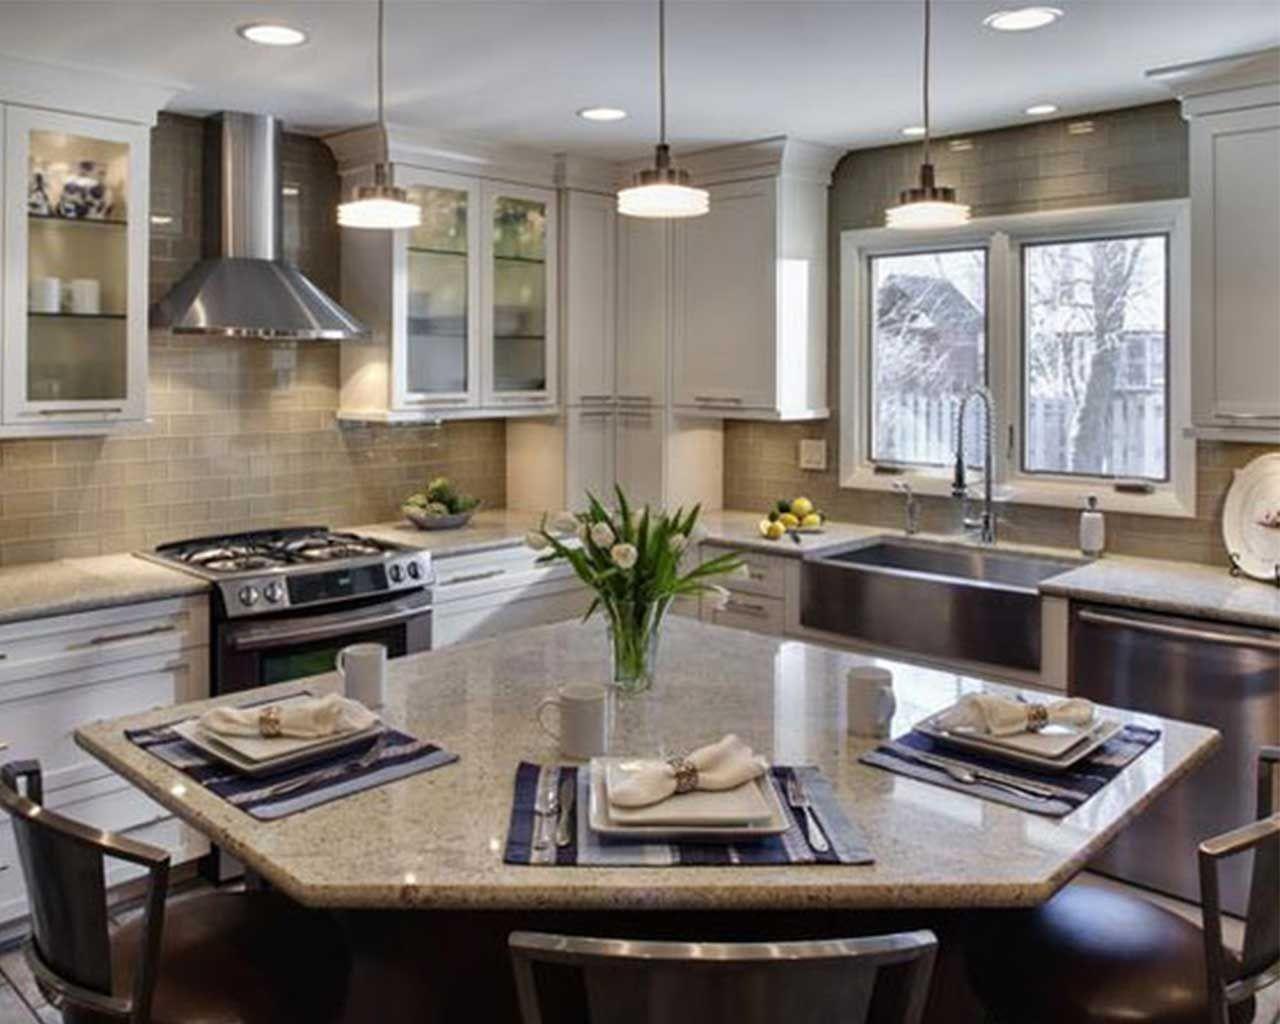 Kitchen Ideas 2020 With Island